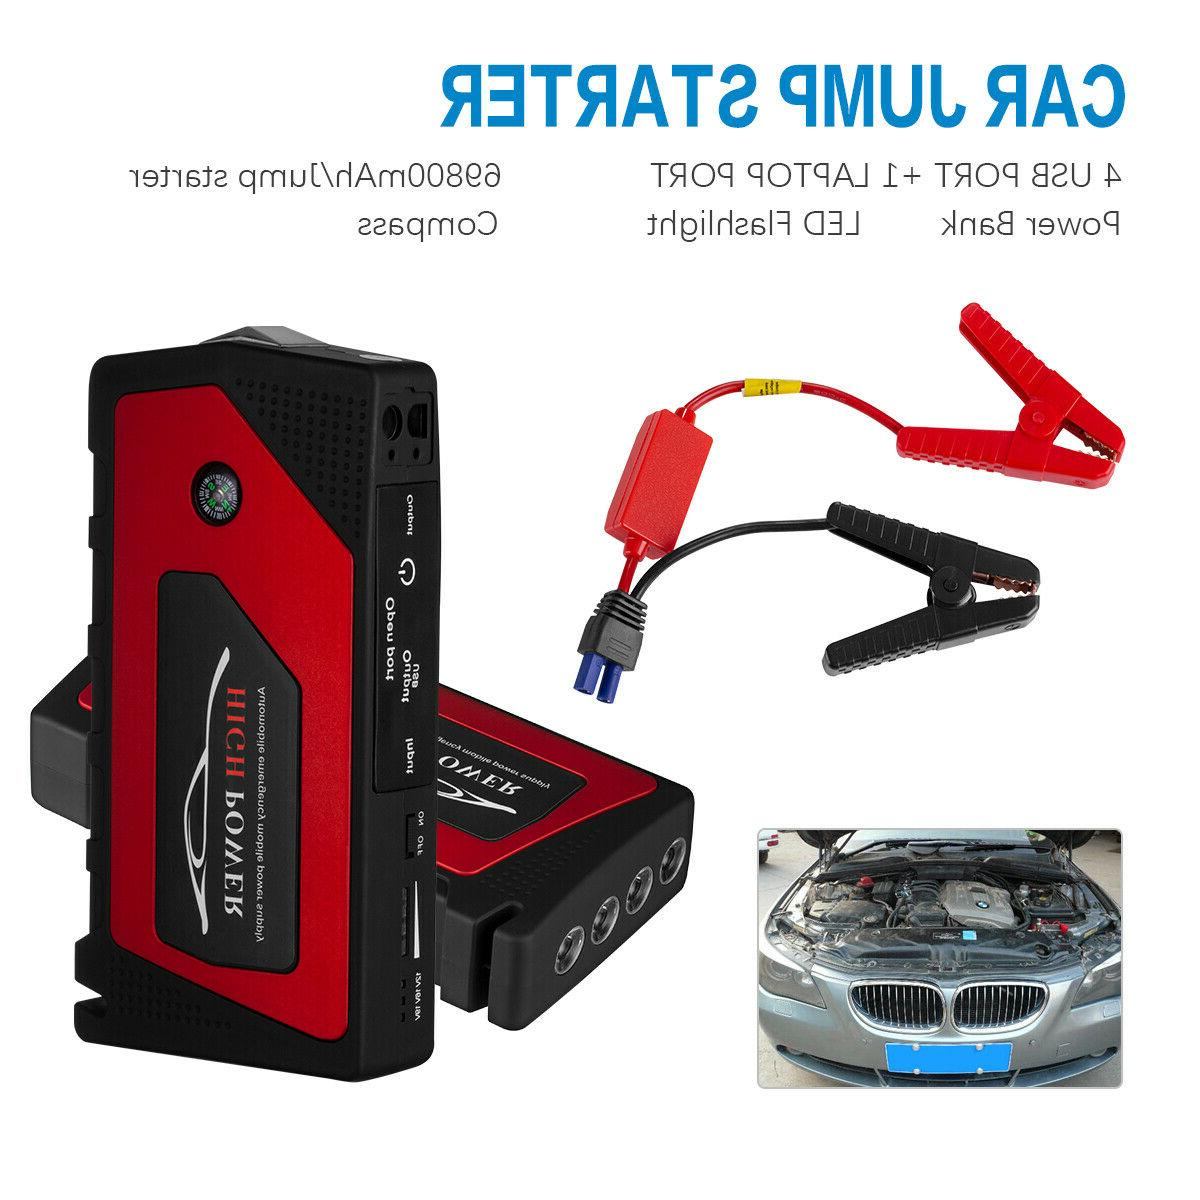 12V Portable USB Battery Clamp 600A 69800mah